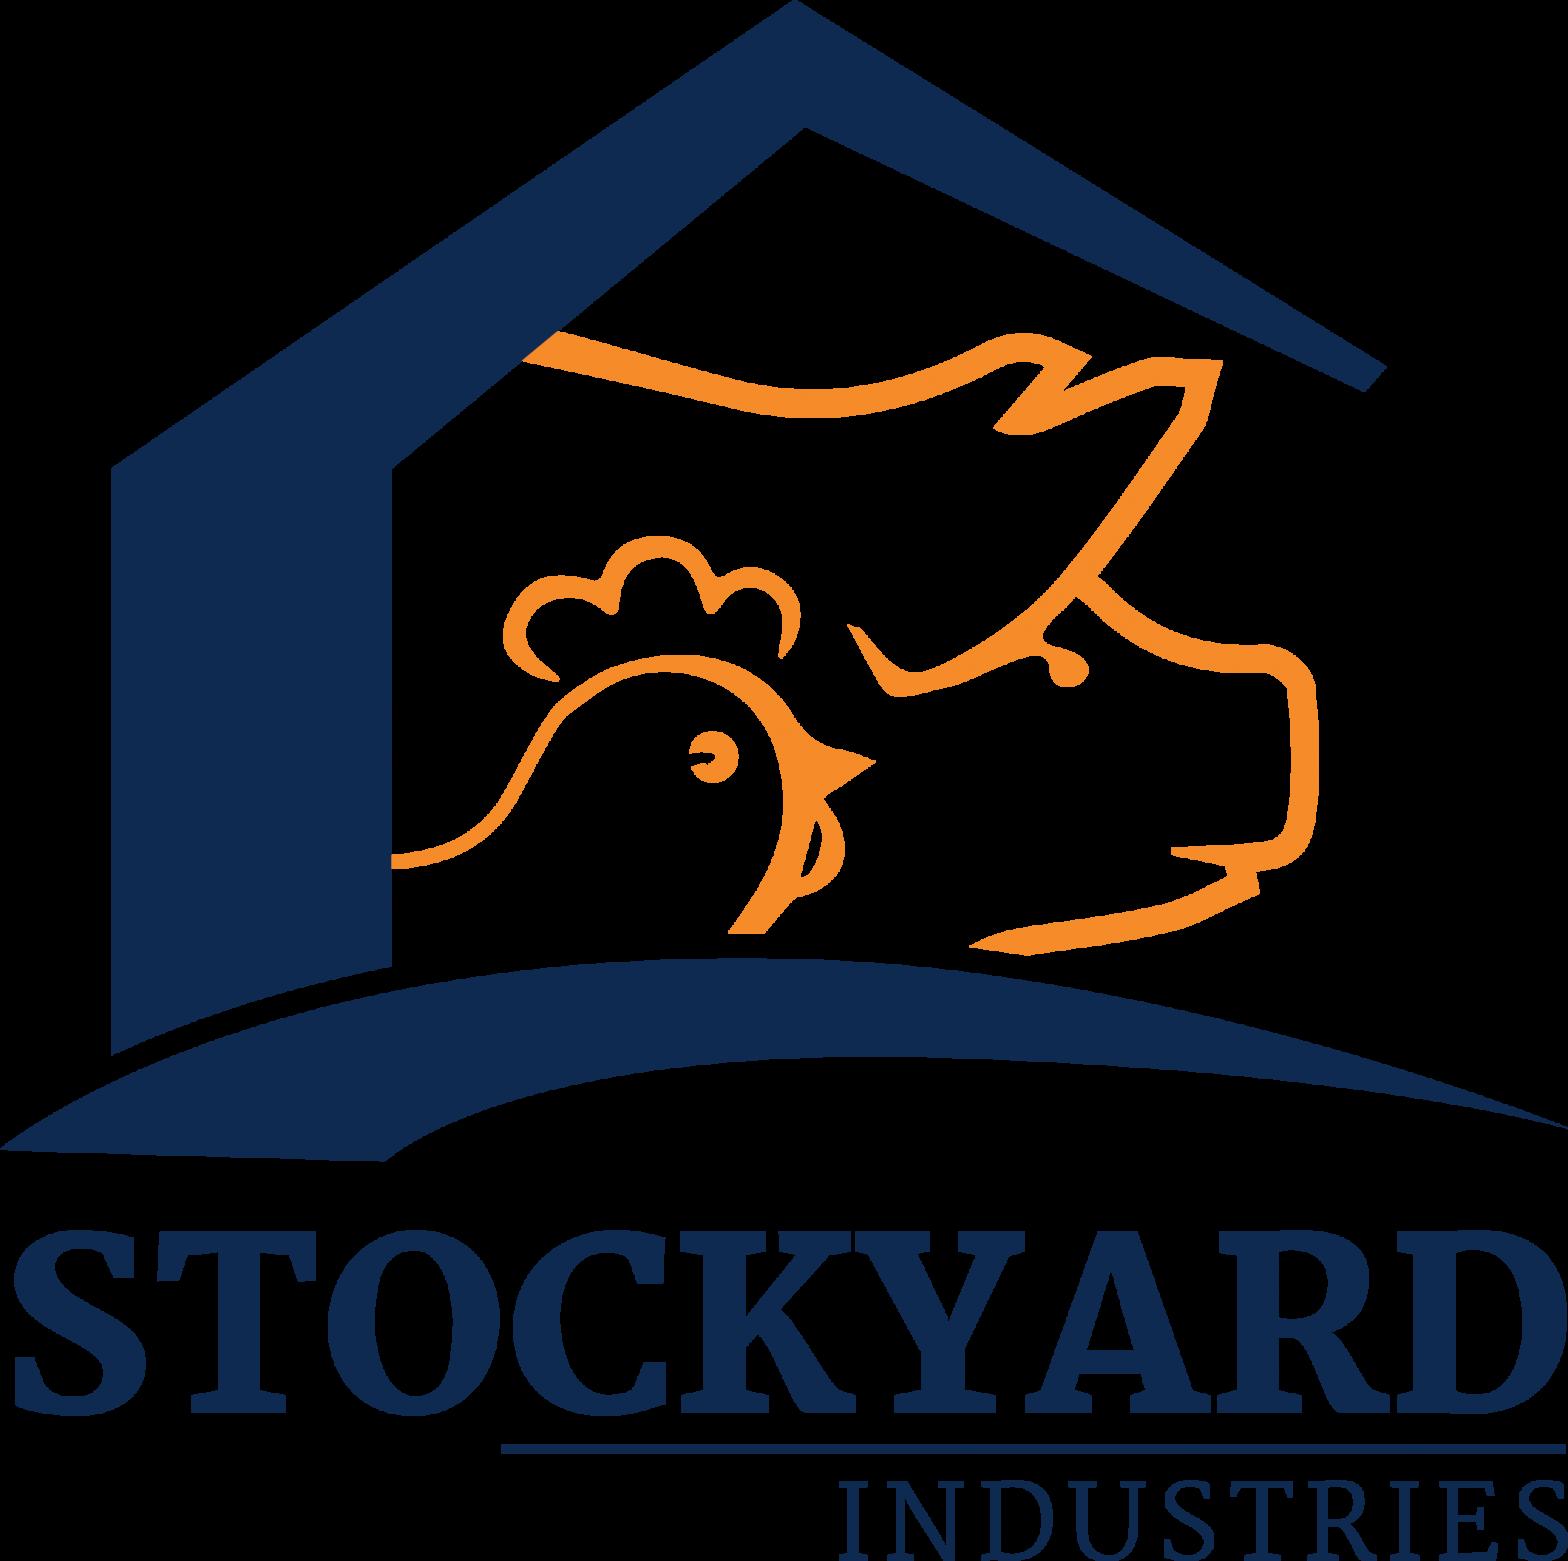 Stockyard Industries Logo